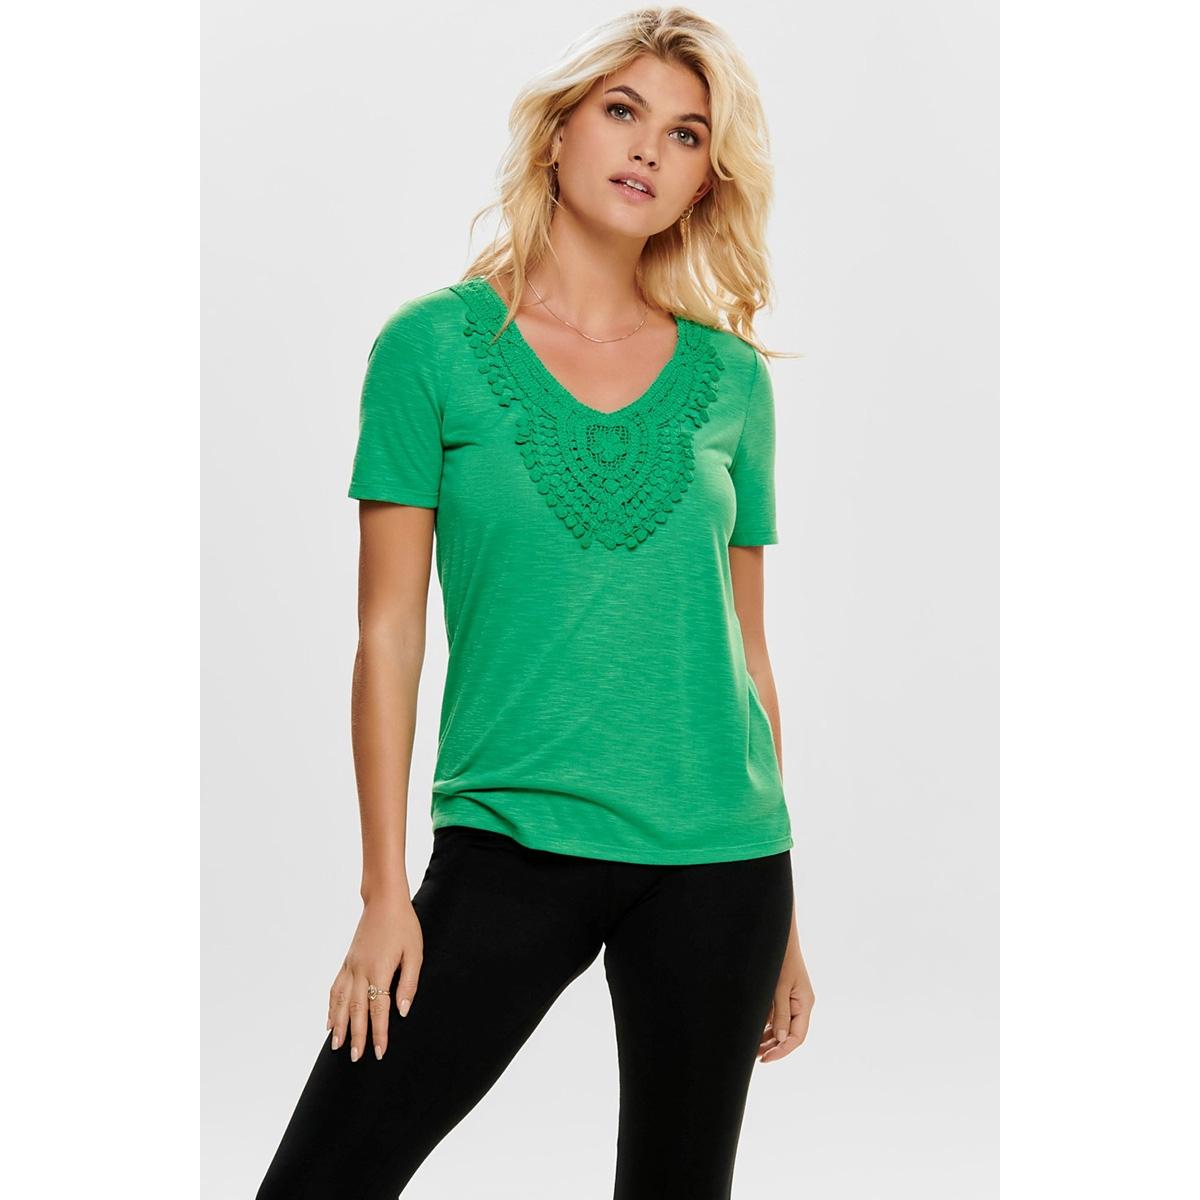 jdydodo s/s top jrs 15154568 jacqueline de yong t-shirt simply green/dtm croche